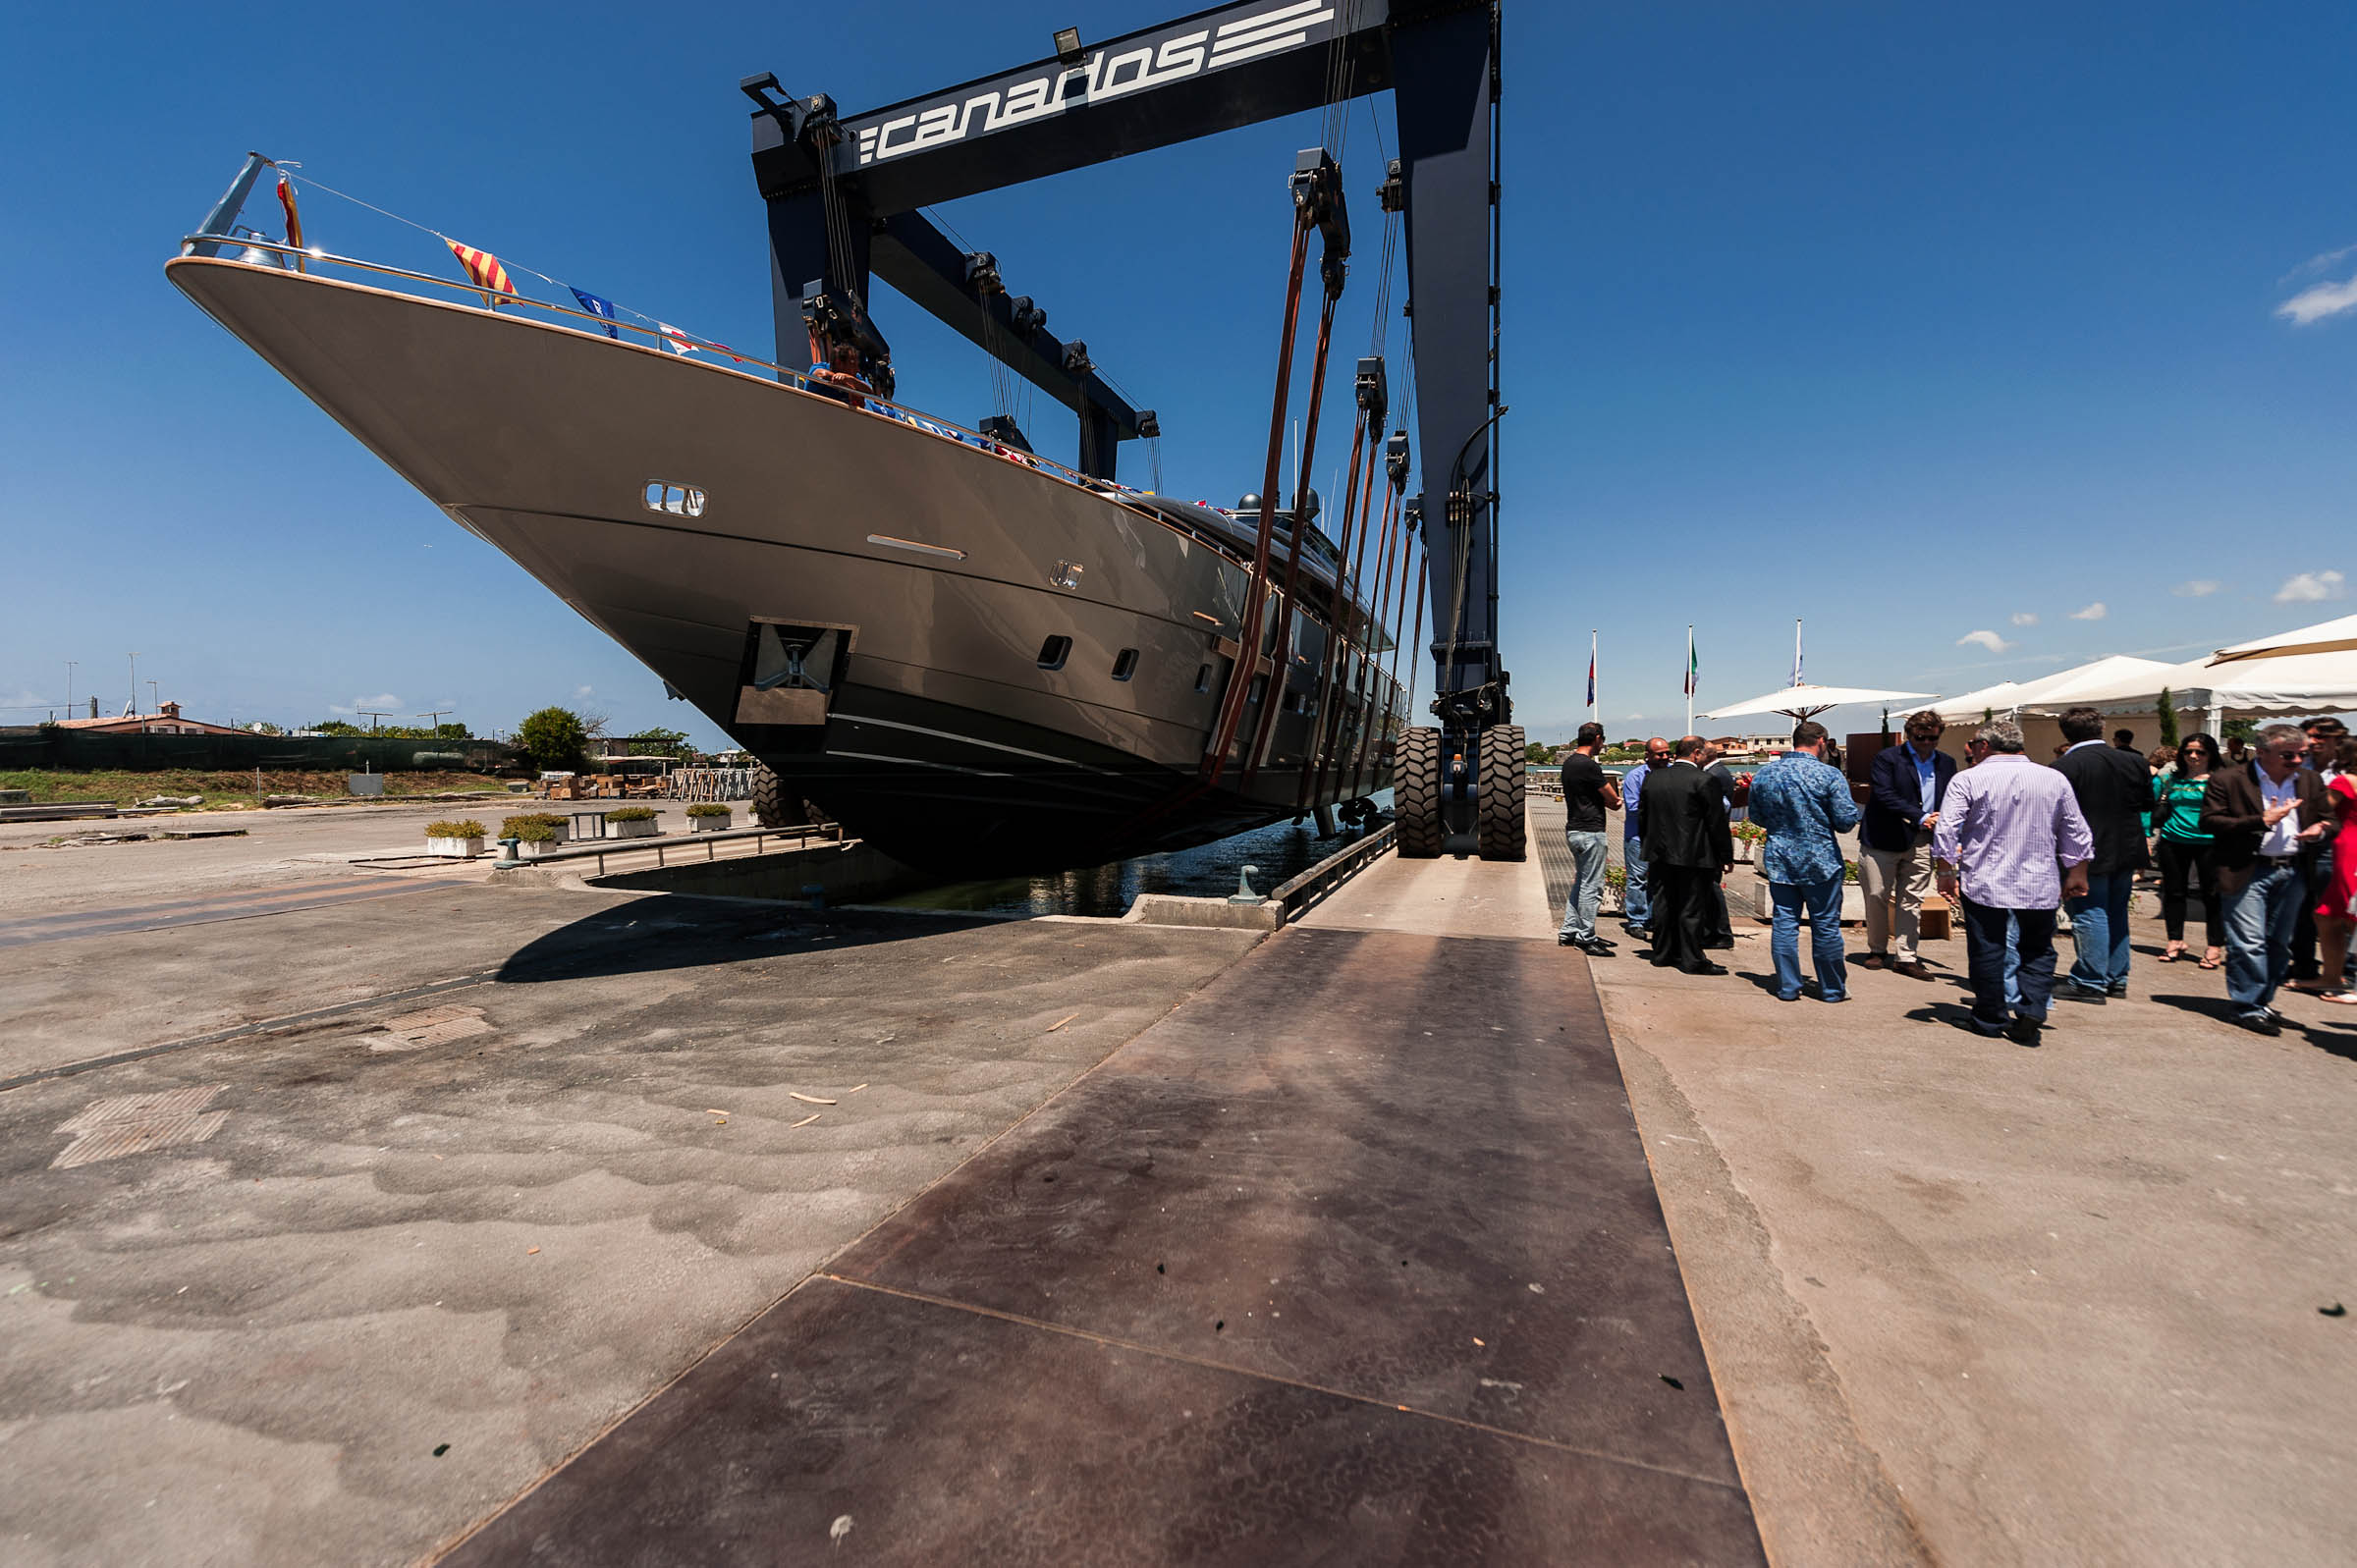 Canados 120 motor yacht Far Away at launch Photo Credit: A&B Photodesign